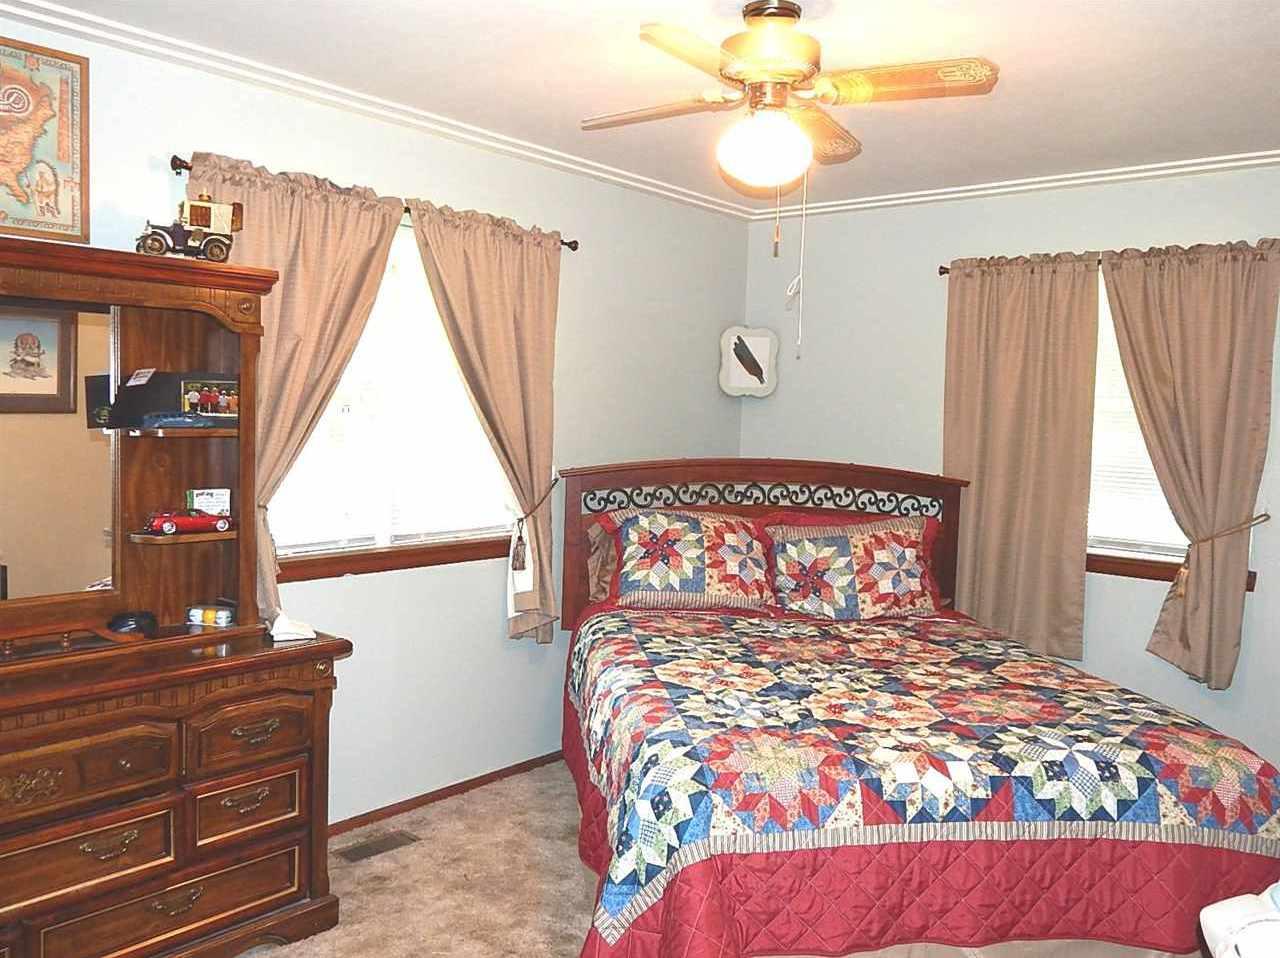 Sold Cross Sale W/ MLS | 712 Sugar Maple Ponca City, OK 74604 7